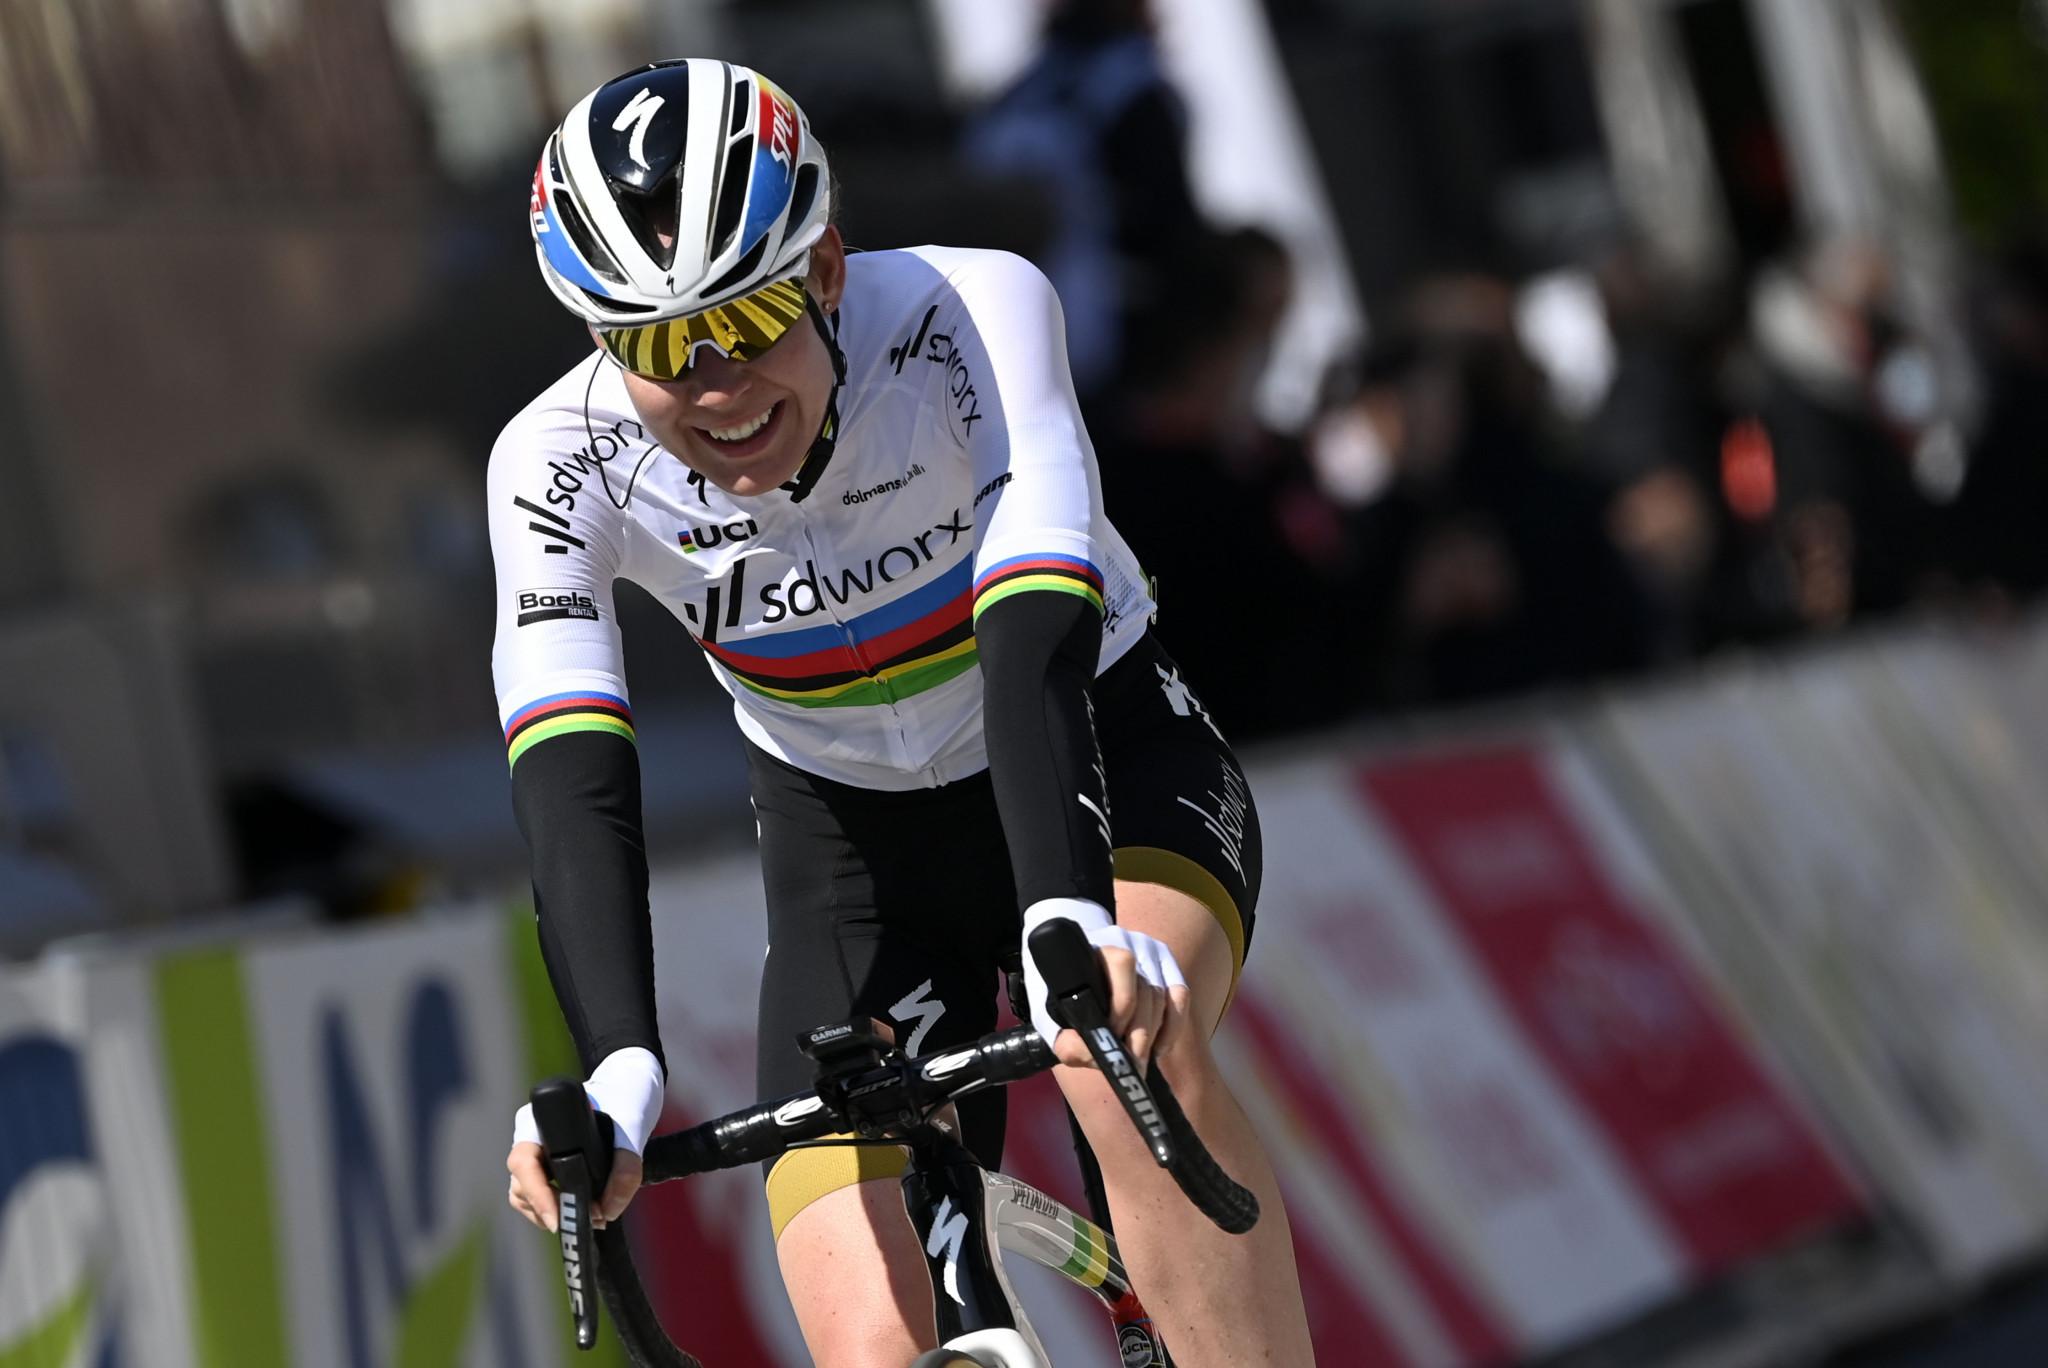 Van der Breggen wins second stage of Giro Donne to secure race lead